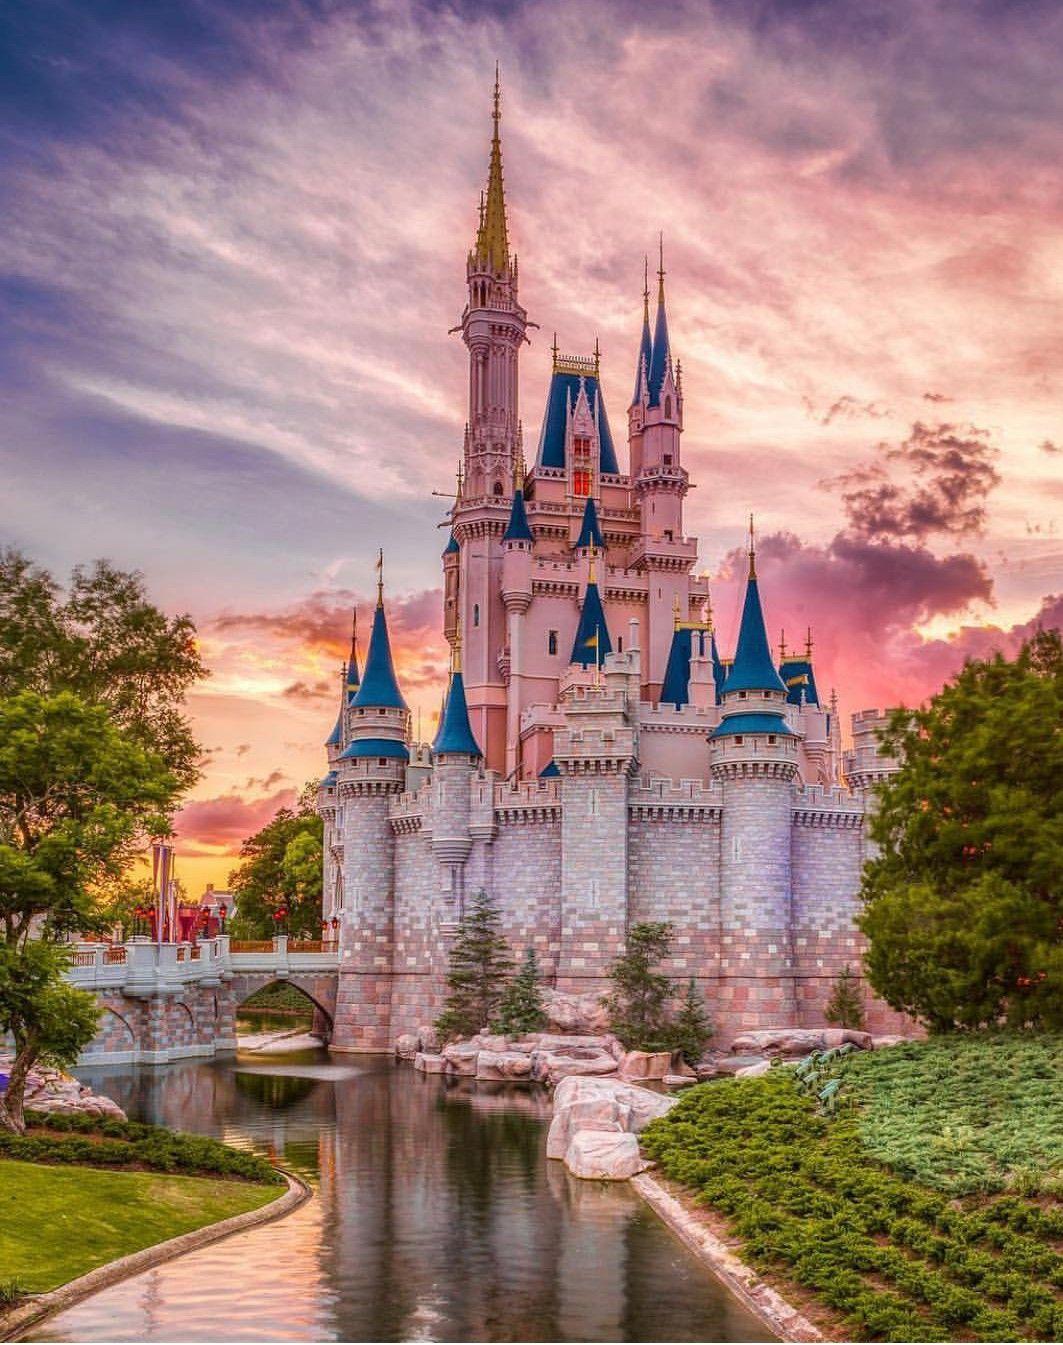 Cinderella S Castle Disney World Pictures Disney Phone Backgrounds Disney Background